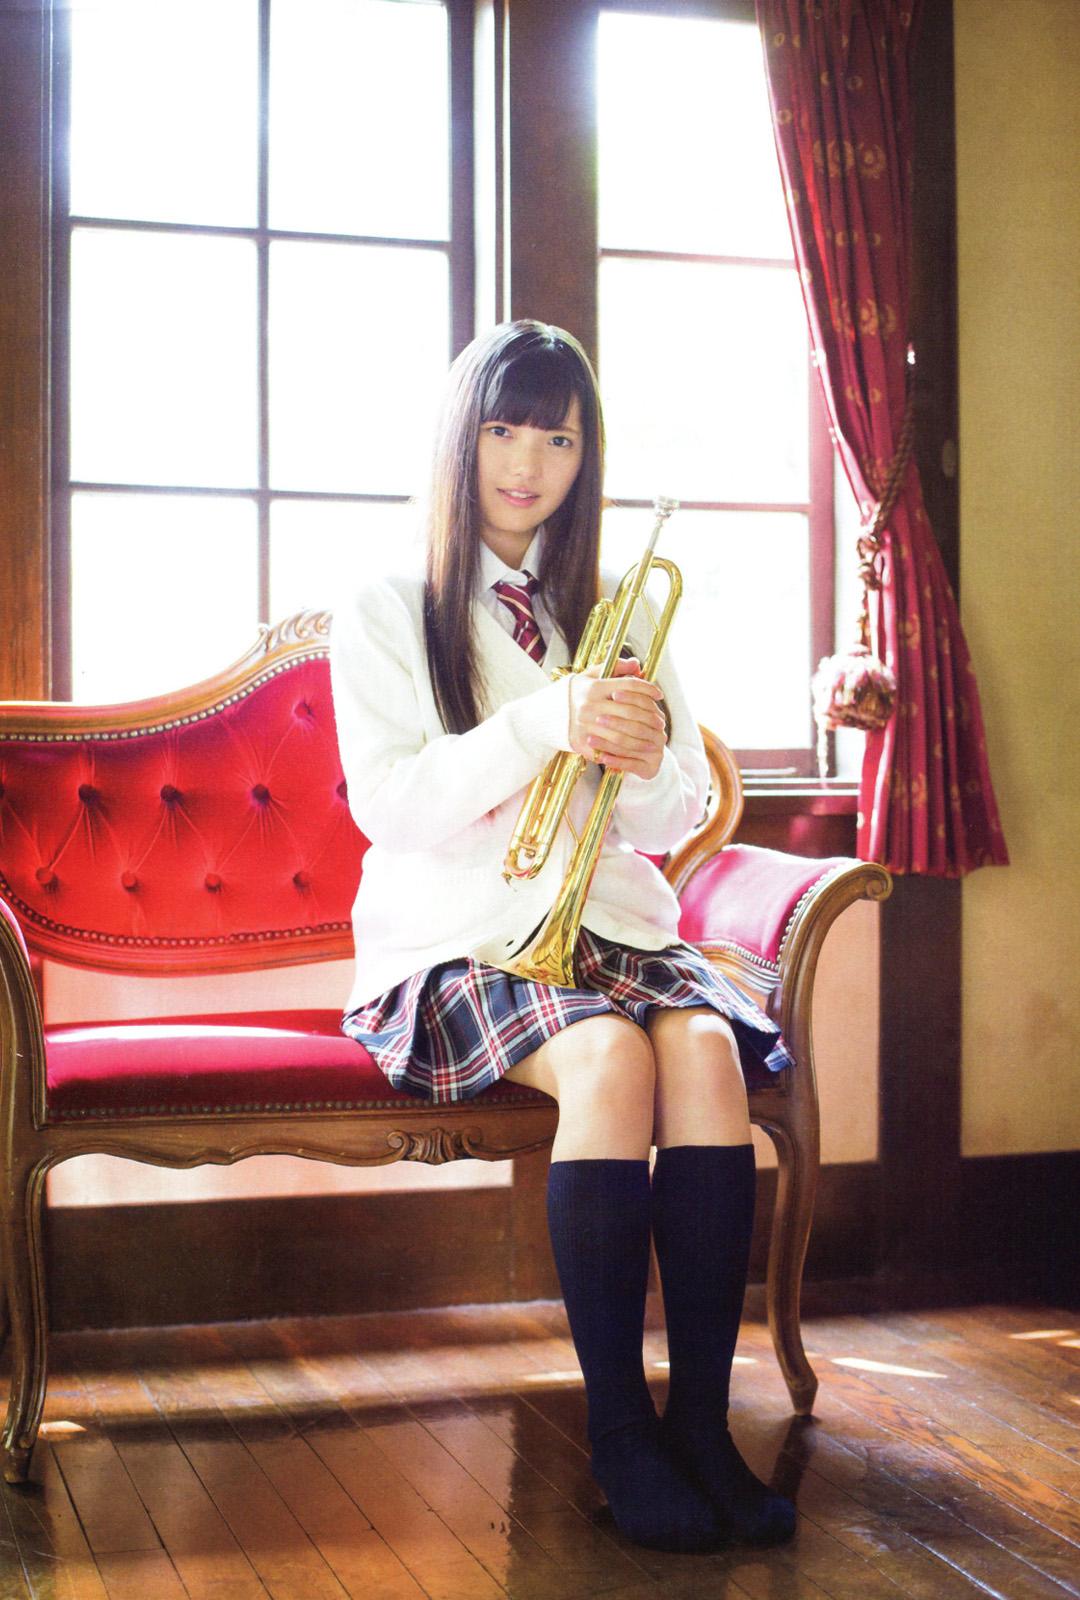 上村莉奈の制服画像